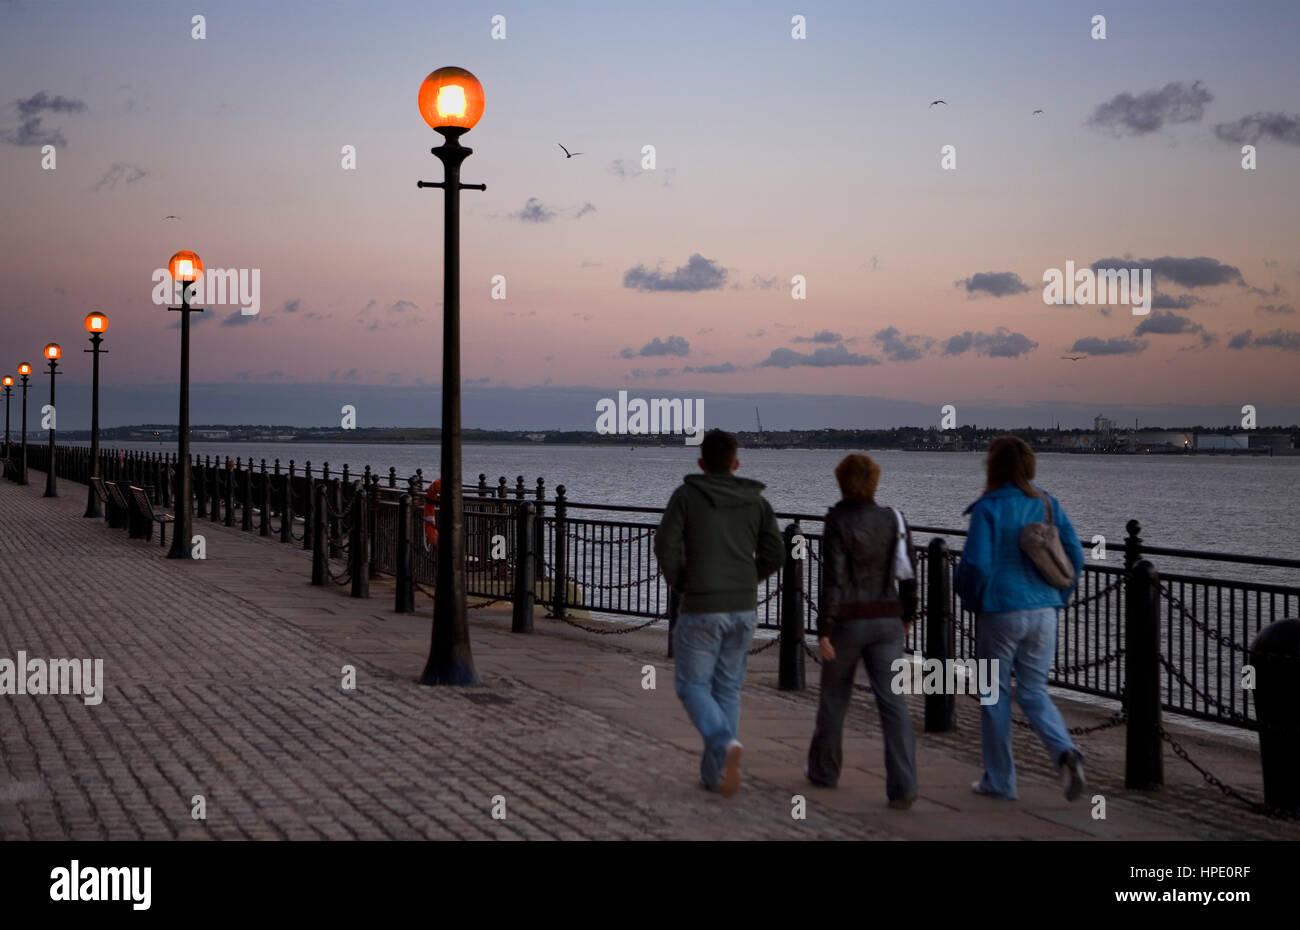 Mersey river, near Albert Dock.Liverpool. England. UK - Stock Image